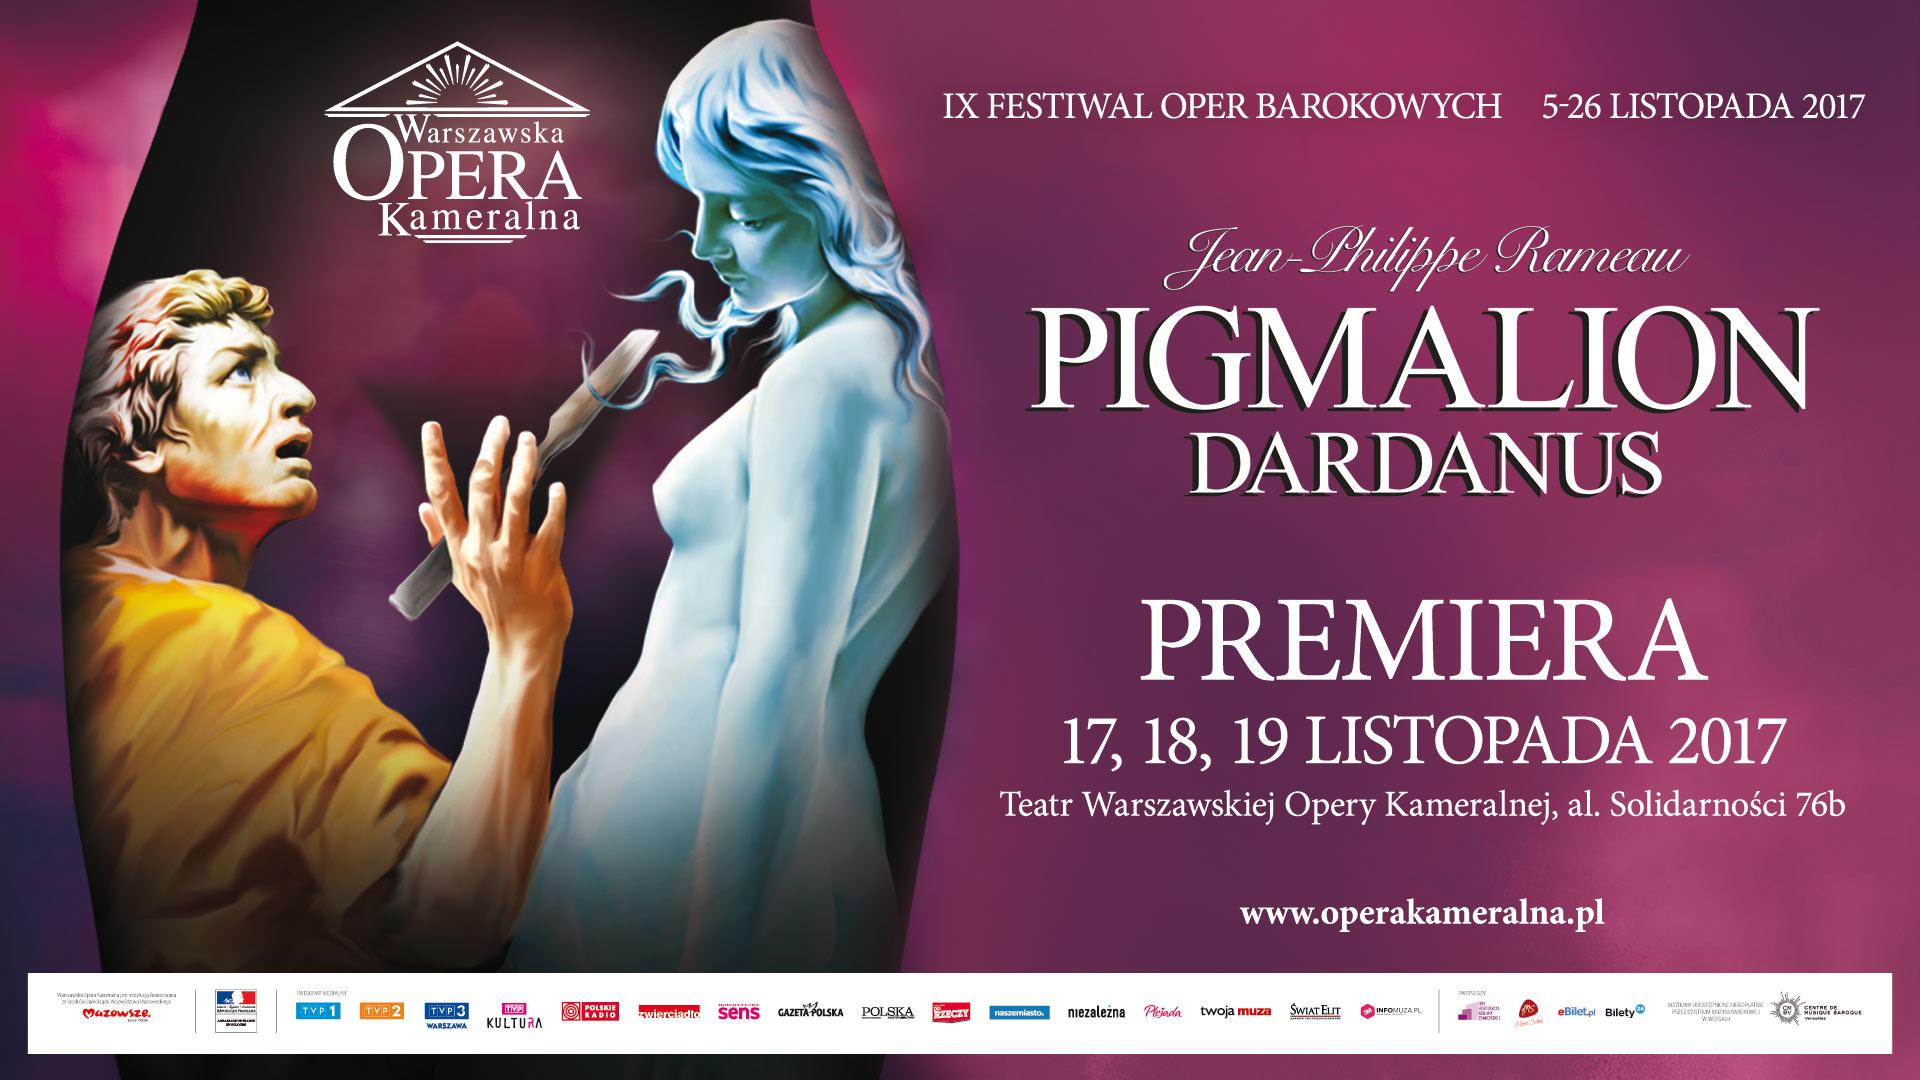 PIGMALION / DARDANUS - PREMIERE IN WARSAW CHAMBER OPERA